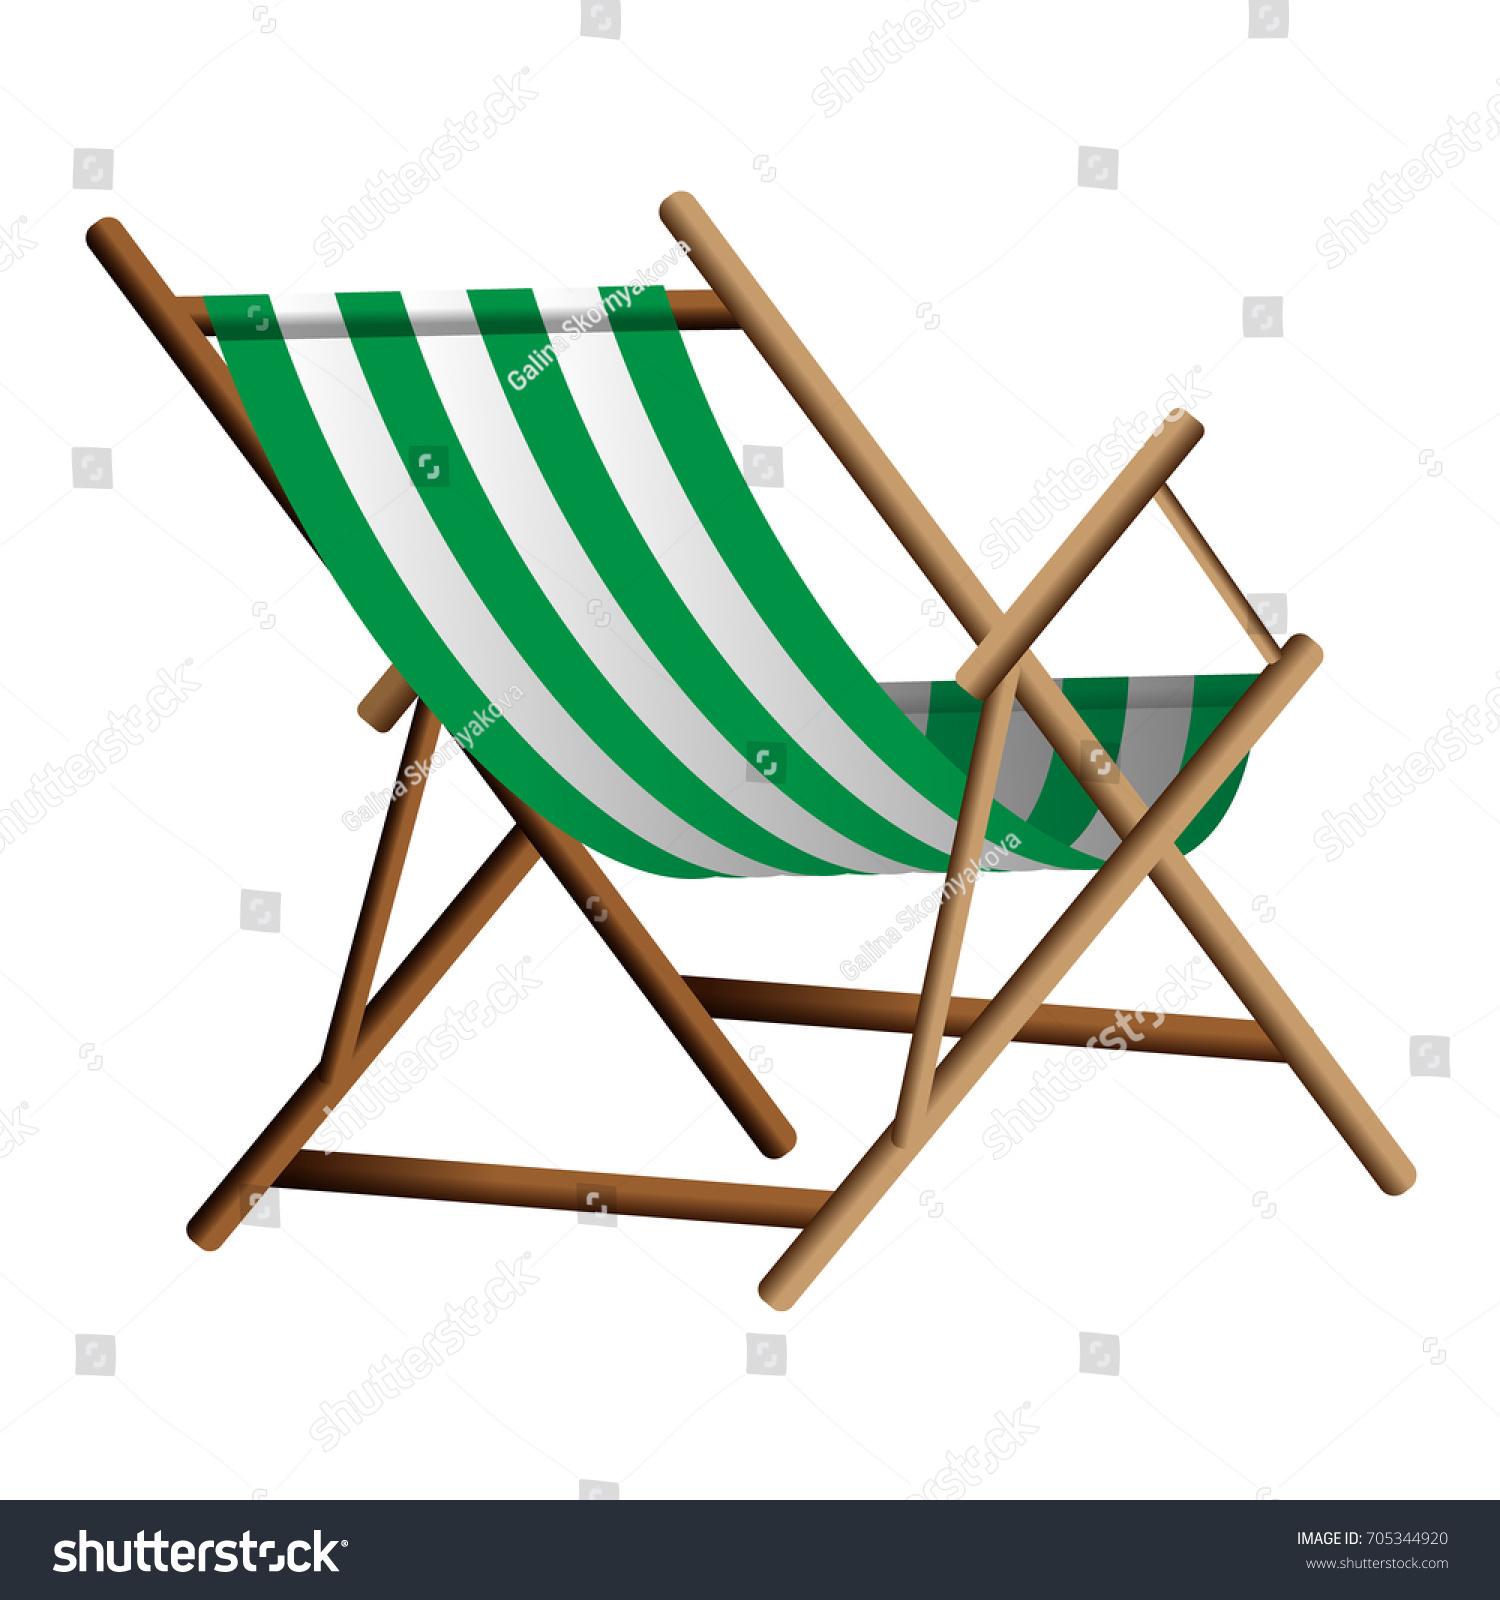 chaise green longue right products lounge madonna canvas com dekoera element chaiselong sofa modular